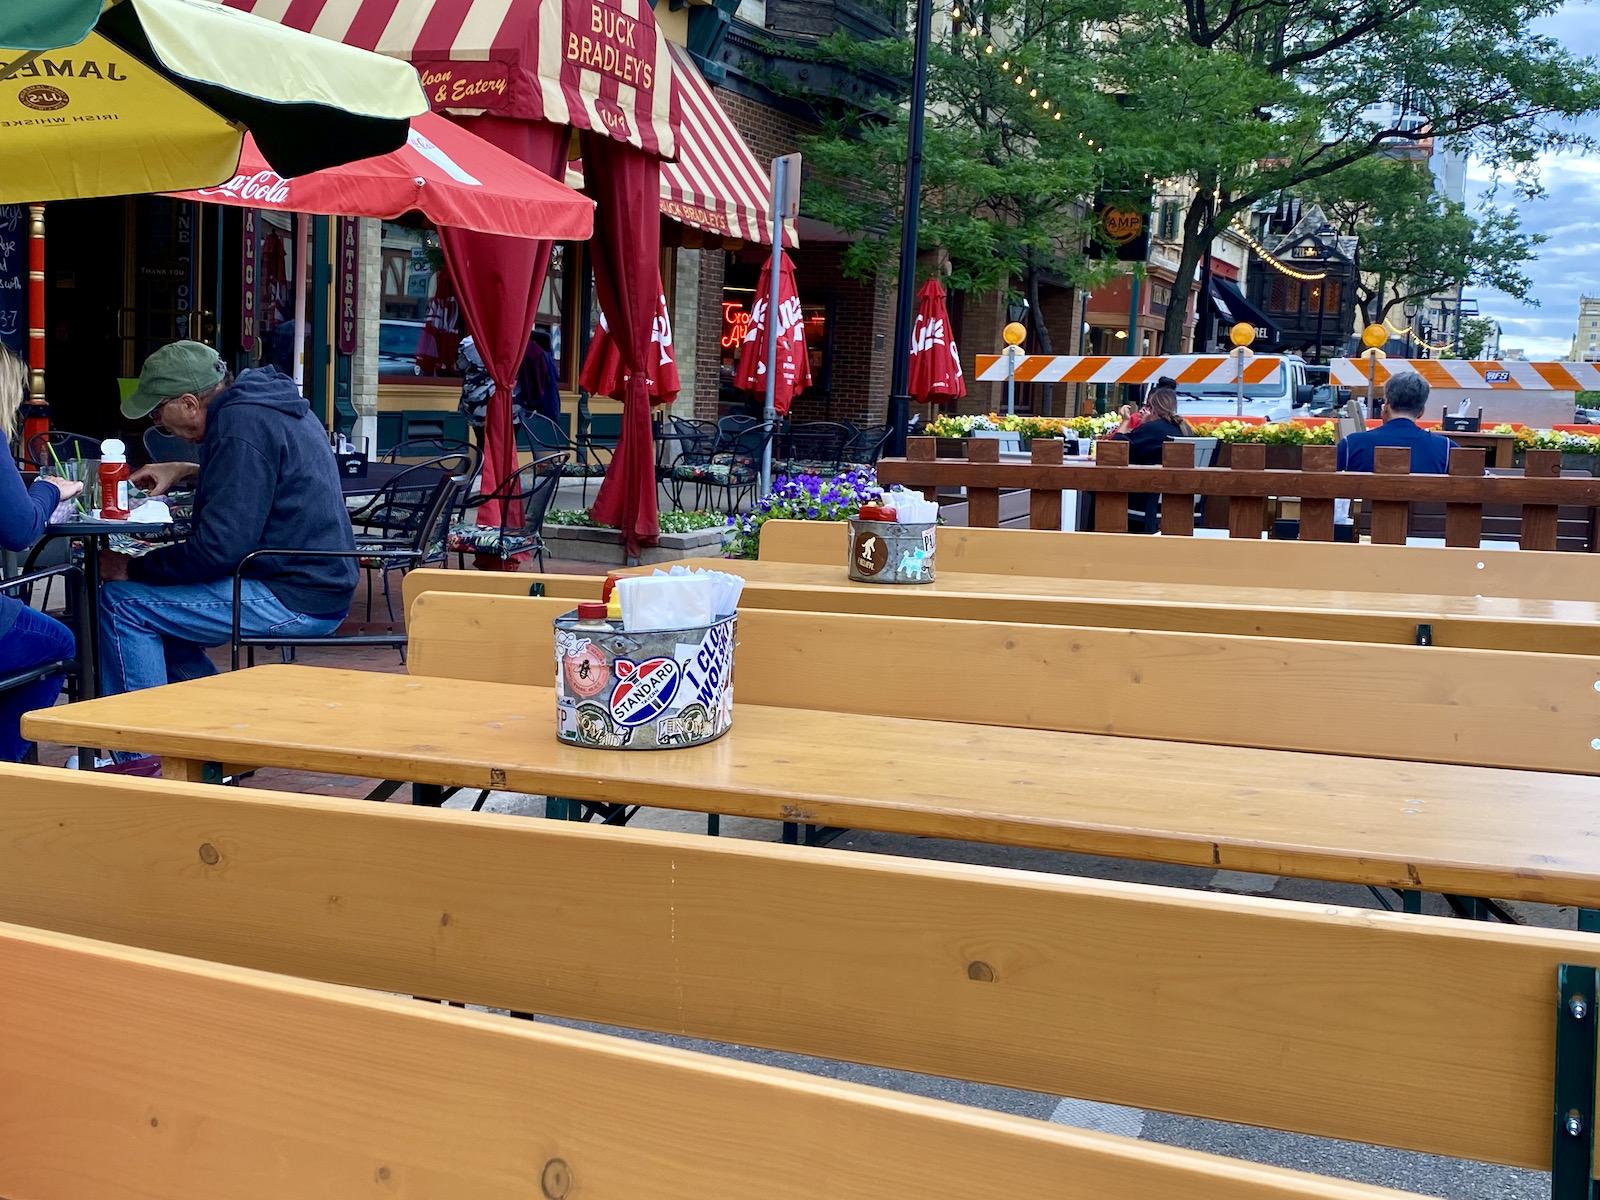 Patio benches